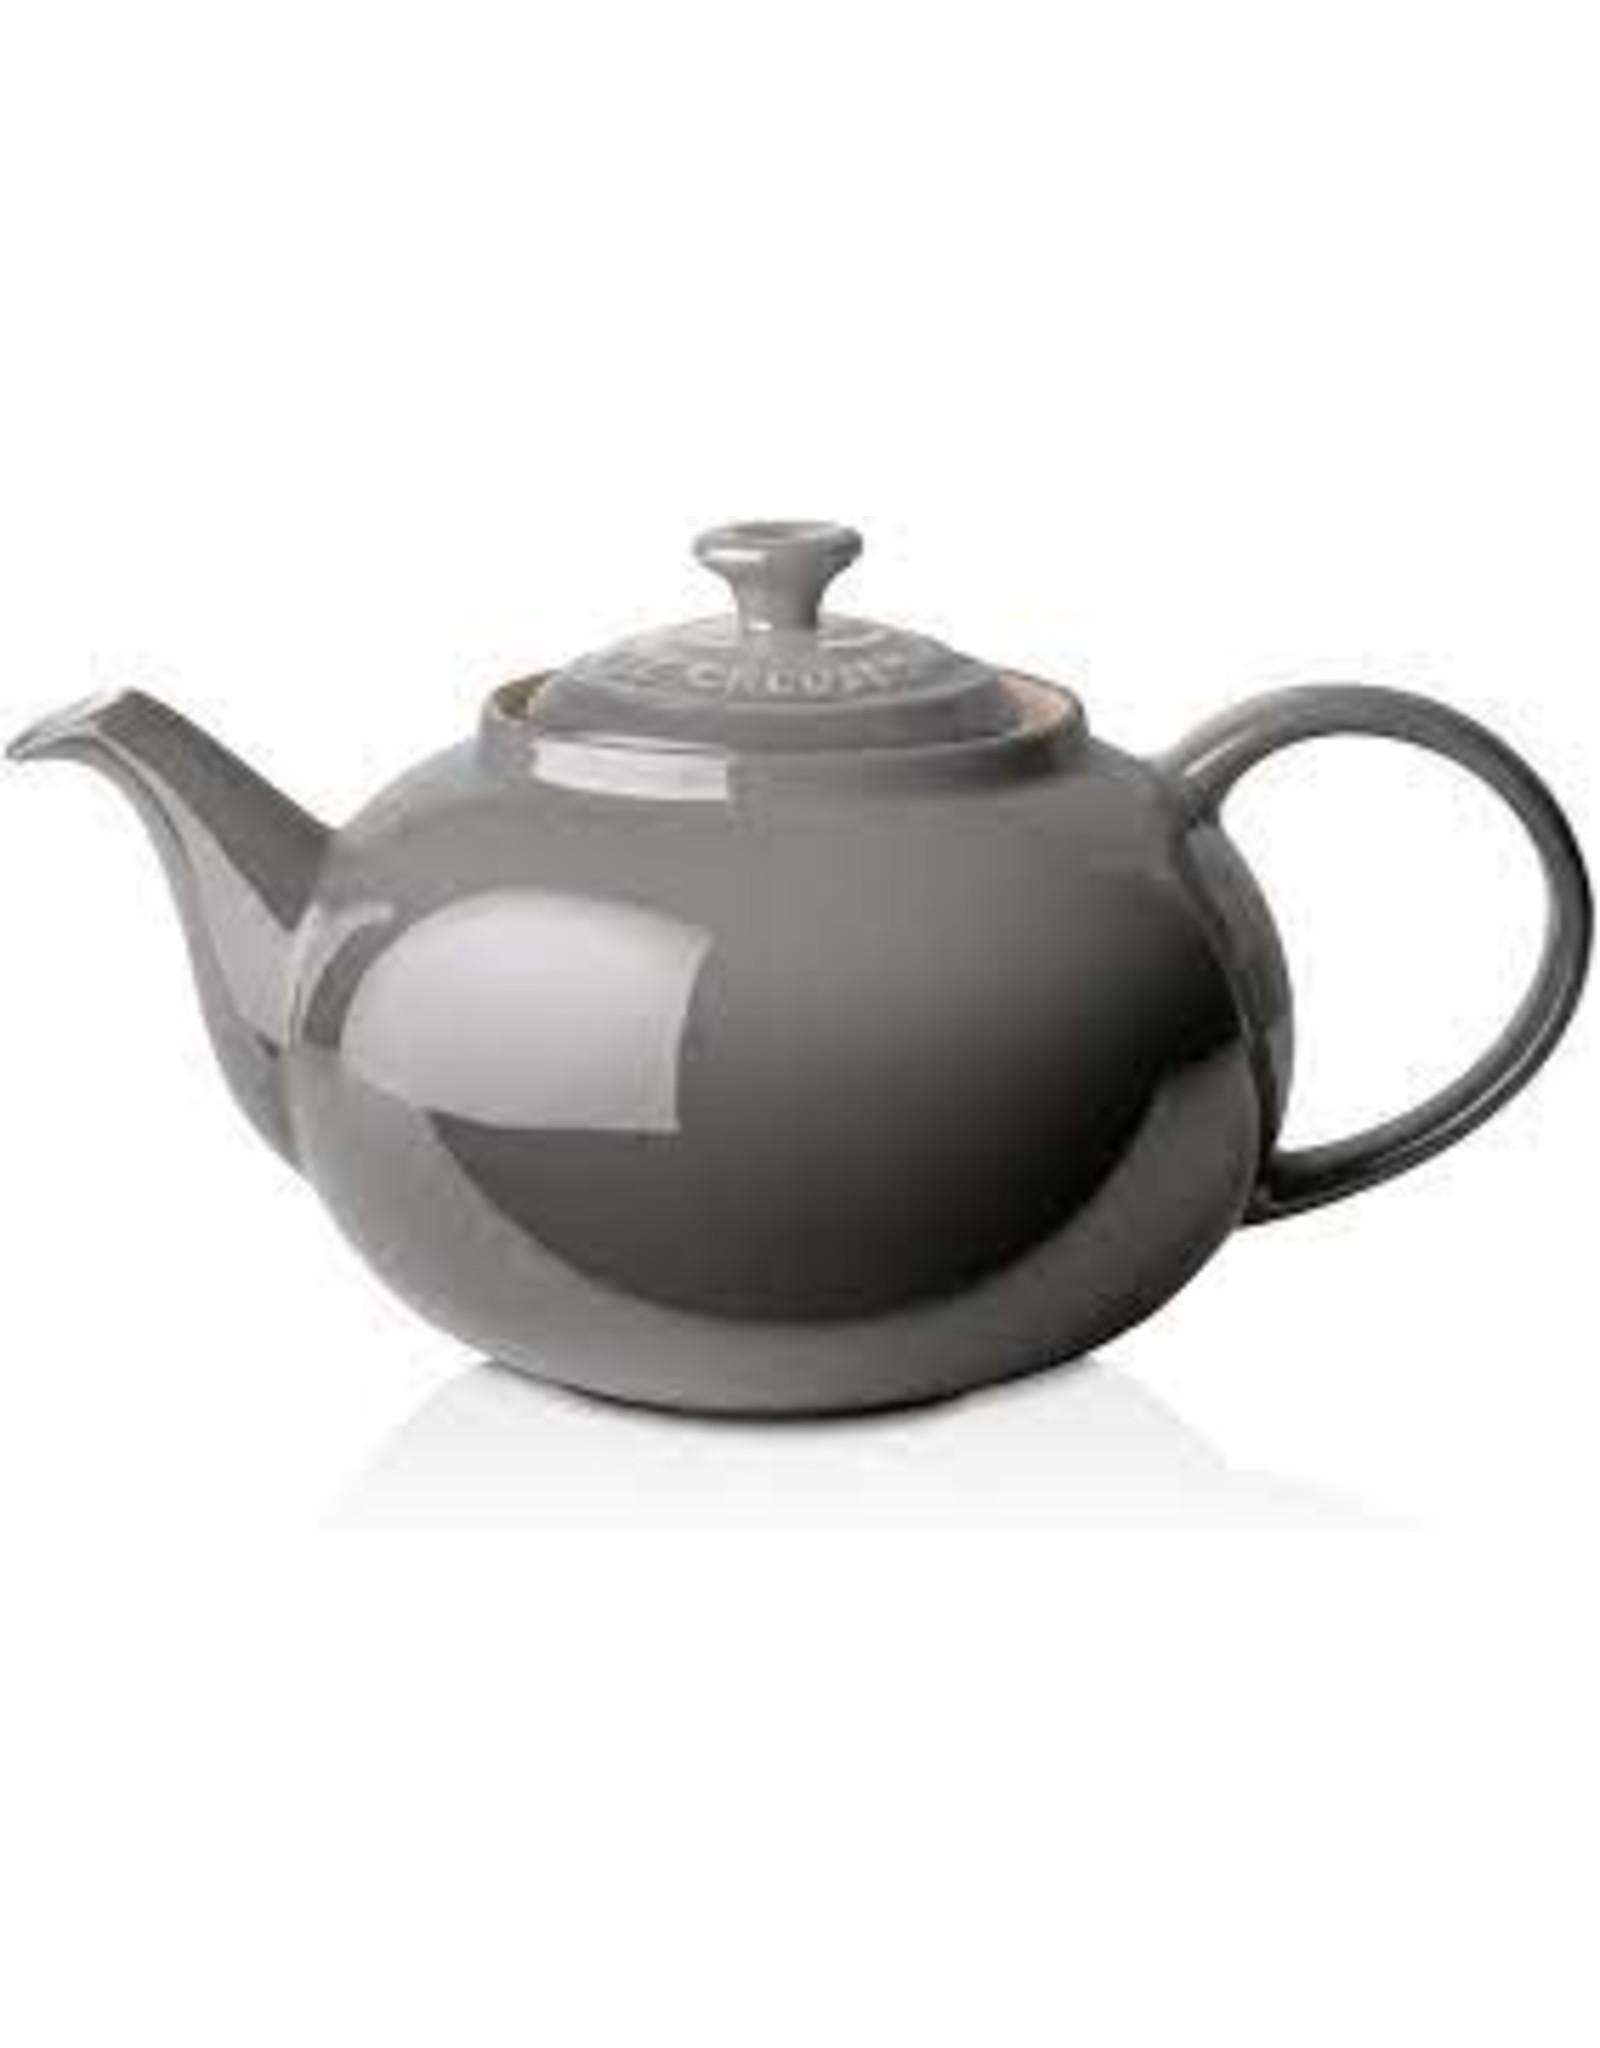 Le Creuset LE CREUSET Traditional Teapot - Oyster